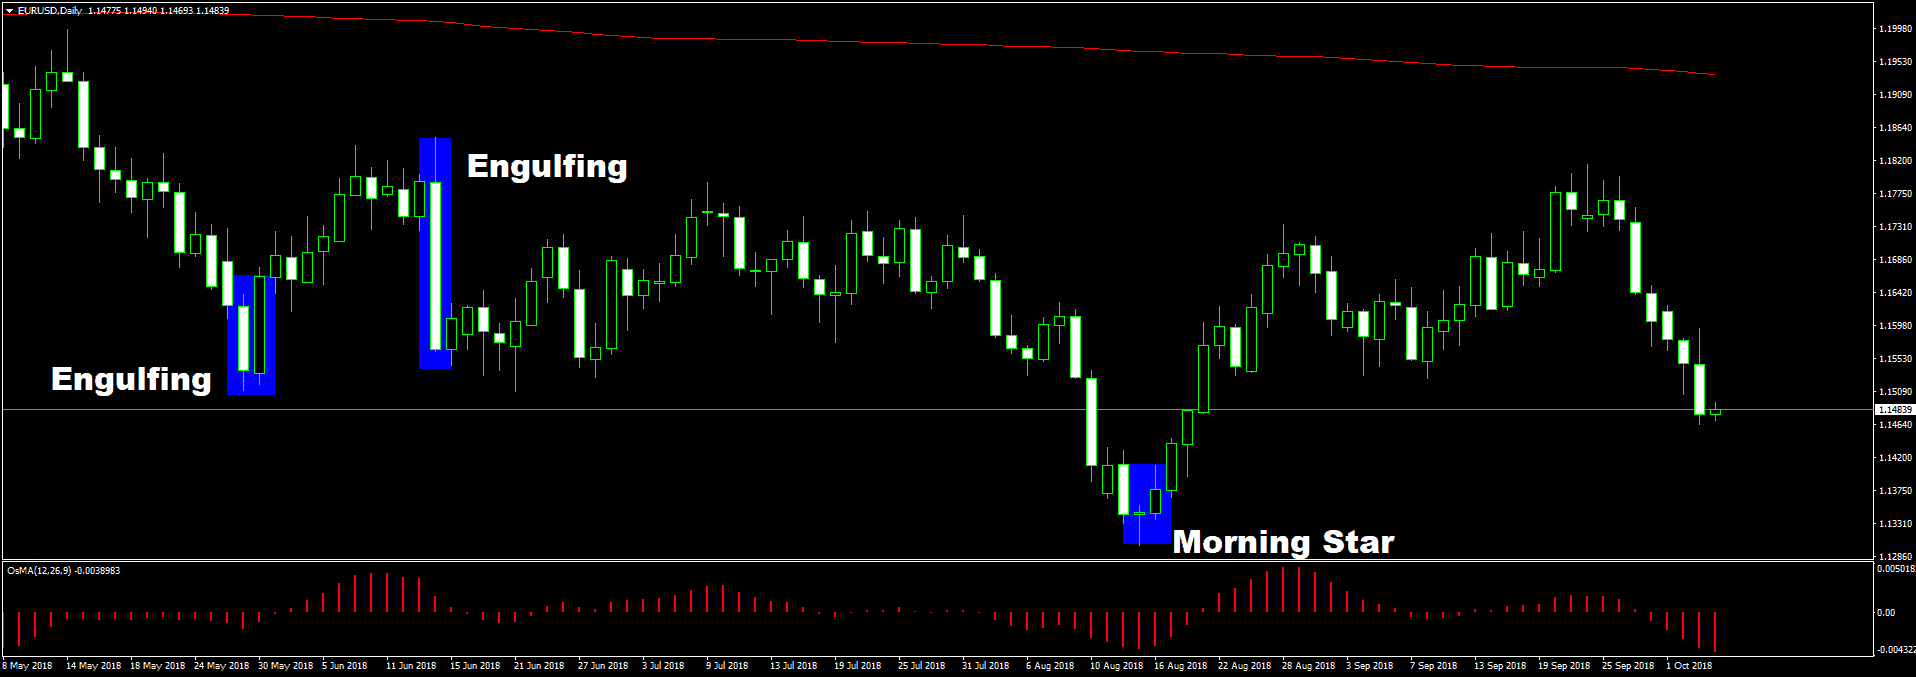 EURUSDDaily engulf a morning star Základy technickej analýzy